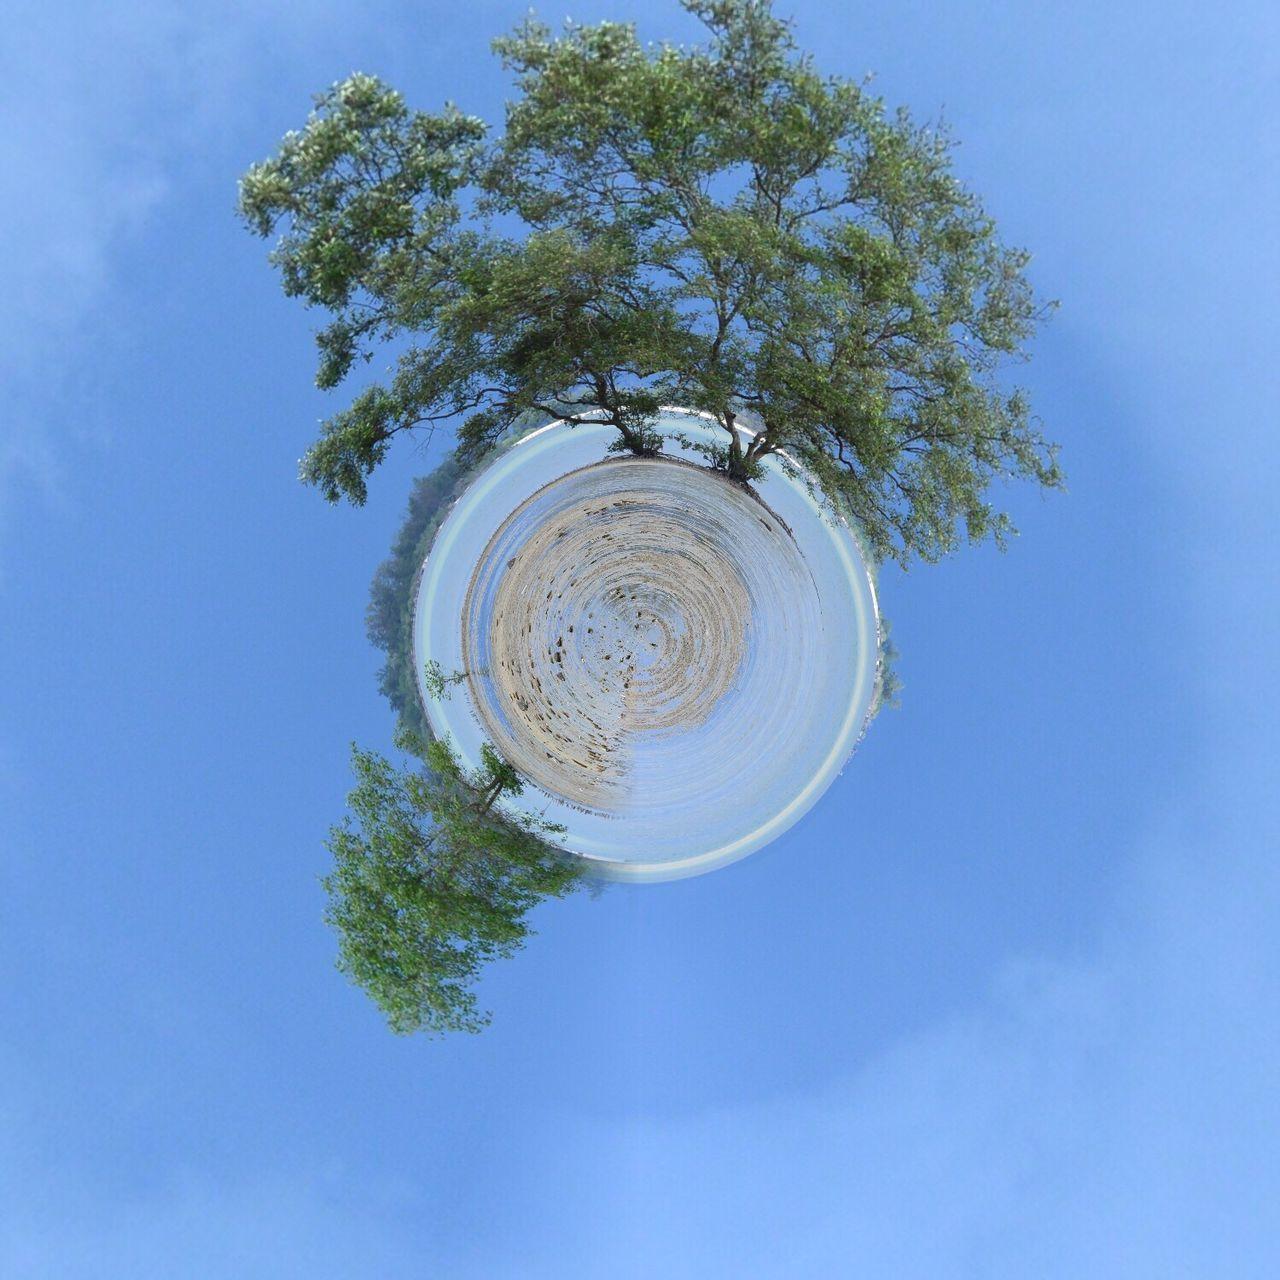 360 Tinyworld Beach Mangrove Sungaisamak Belitong Wonderfulindonesia